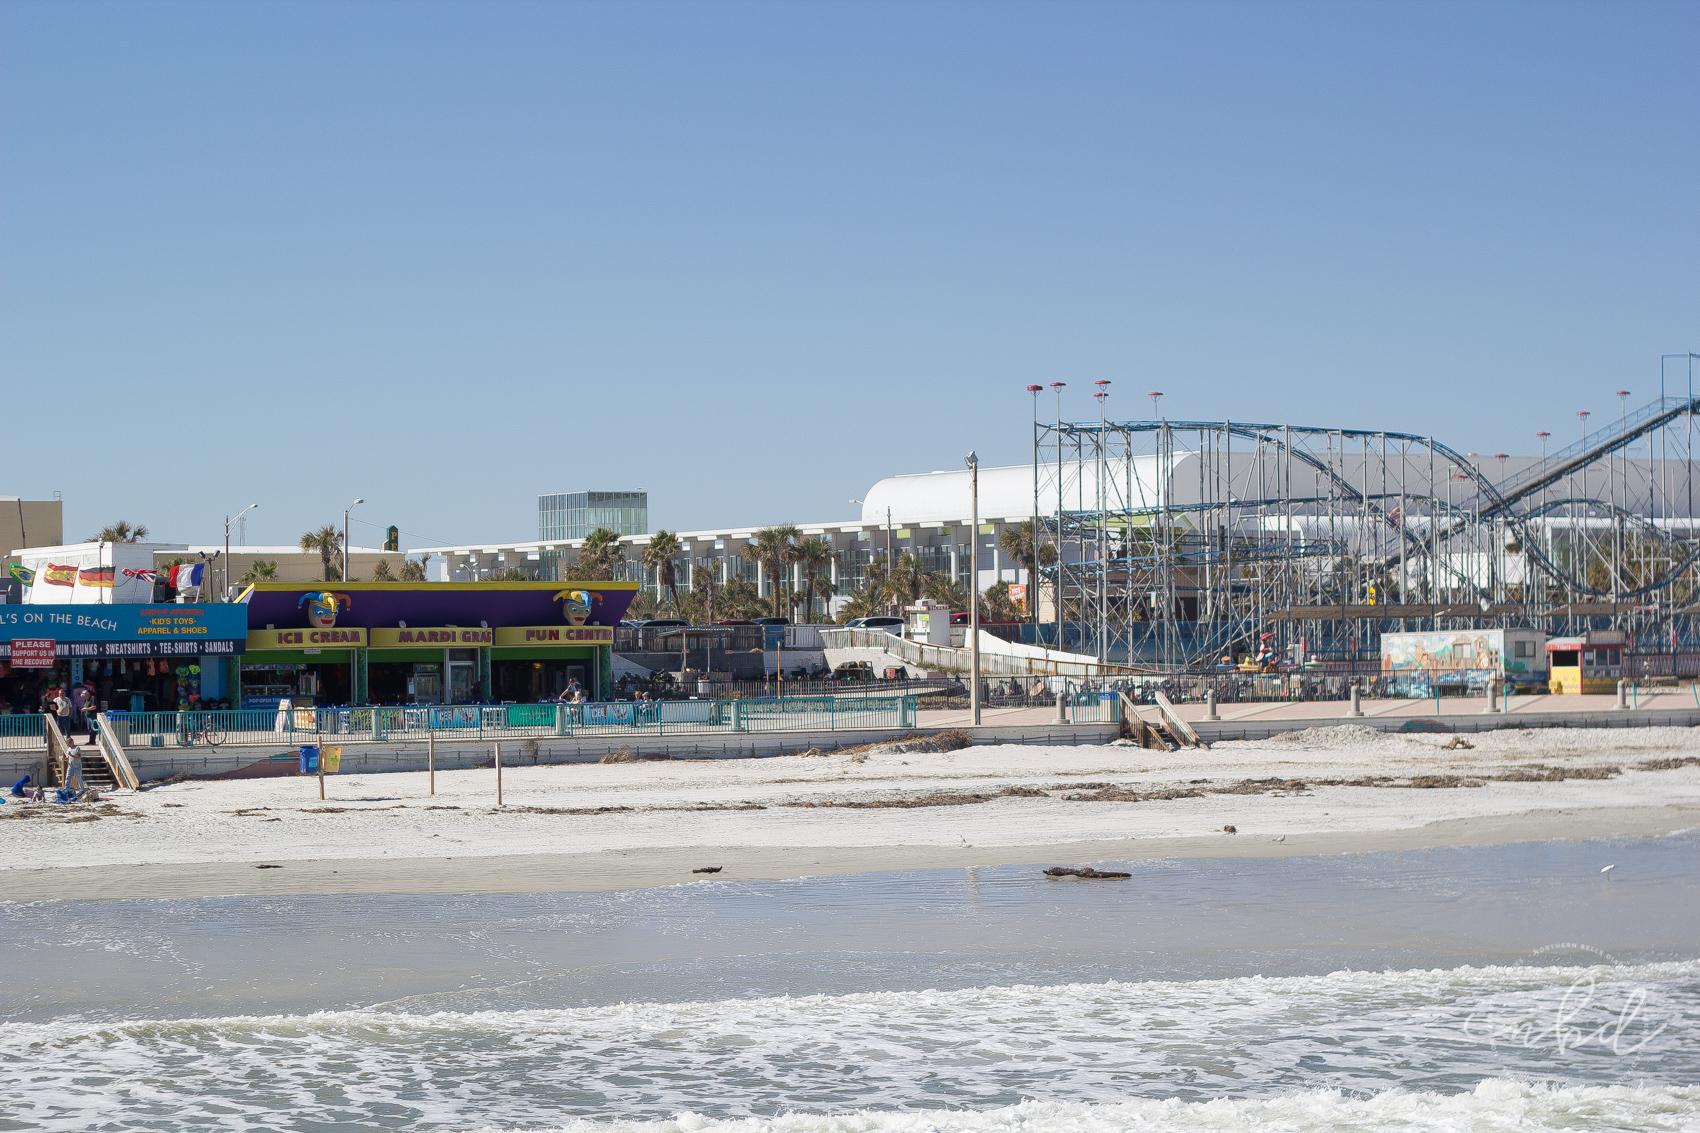 Main Street Pier & Boardwalk - Daytona Beach